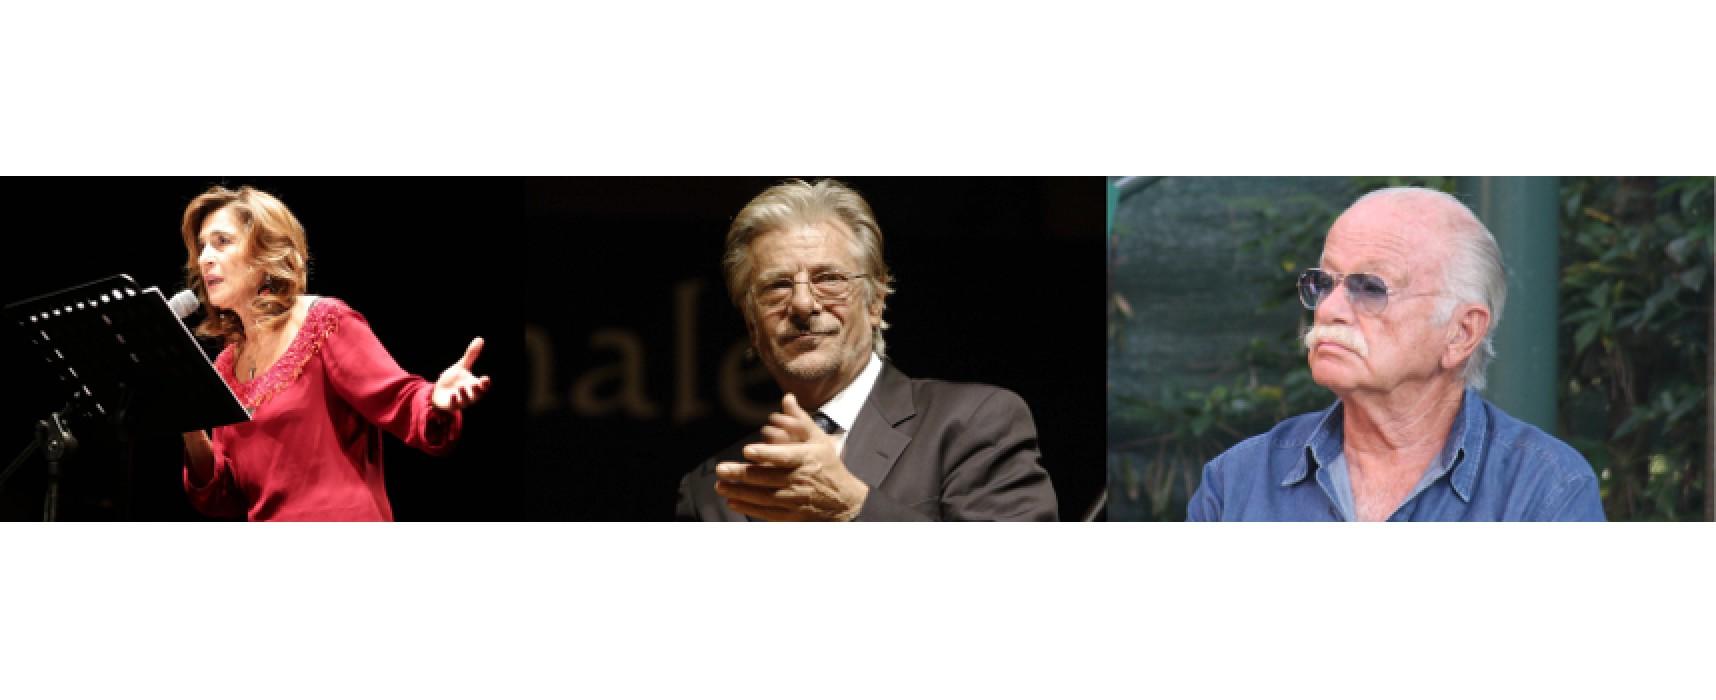 Il CineDolmenFest 2015 ospita tre artisti di spessore: Lina Sastri, Giancarlo Giannini e Gino Paoli